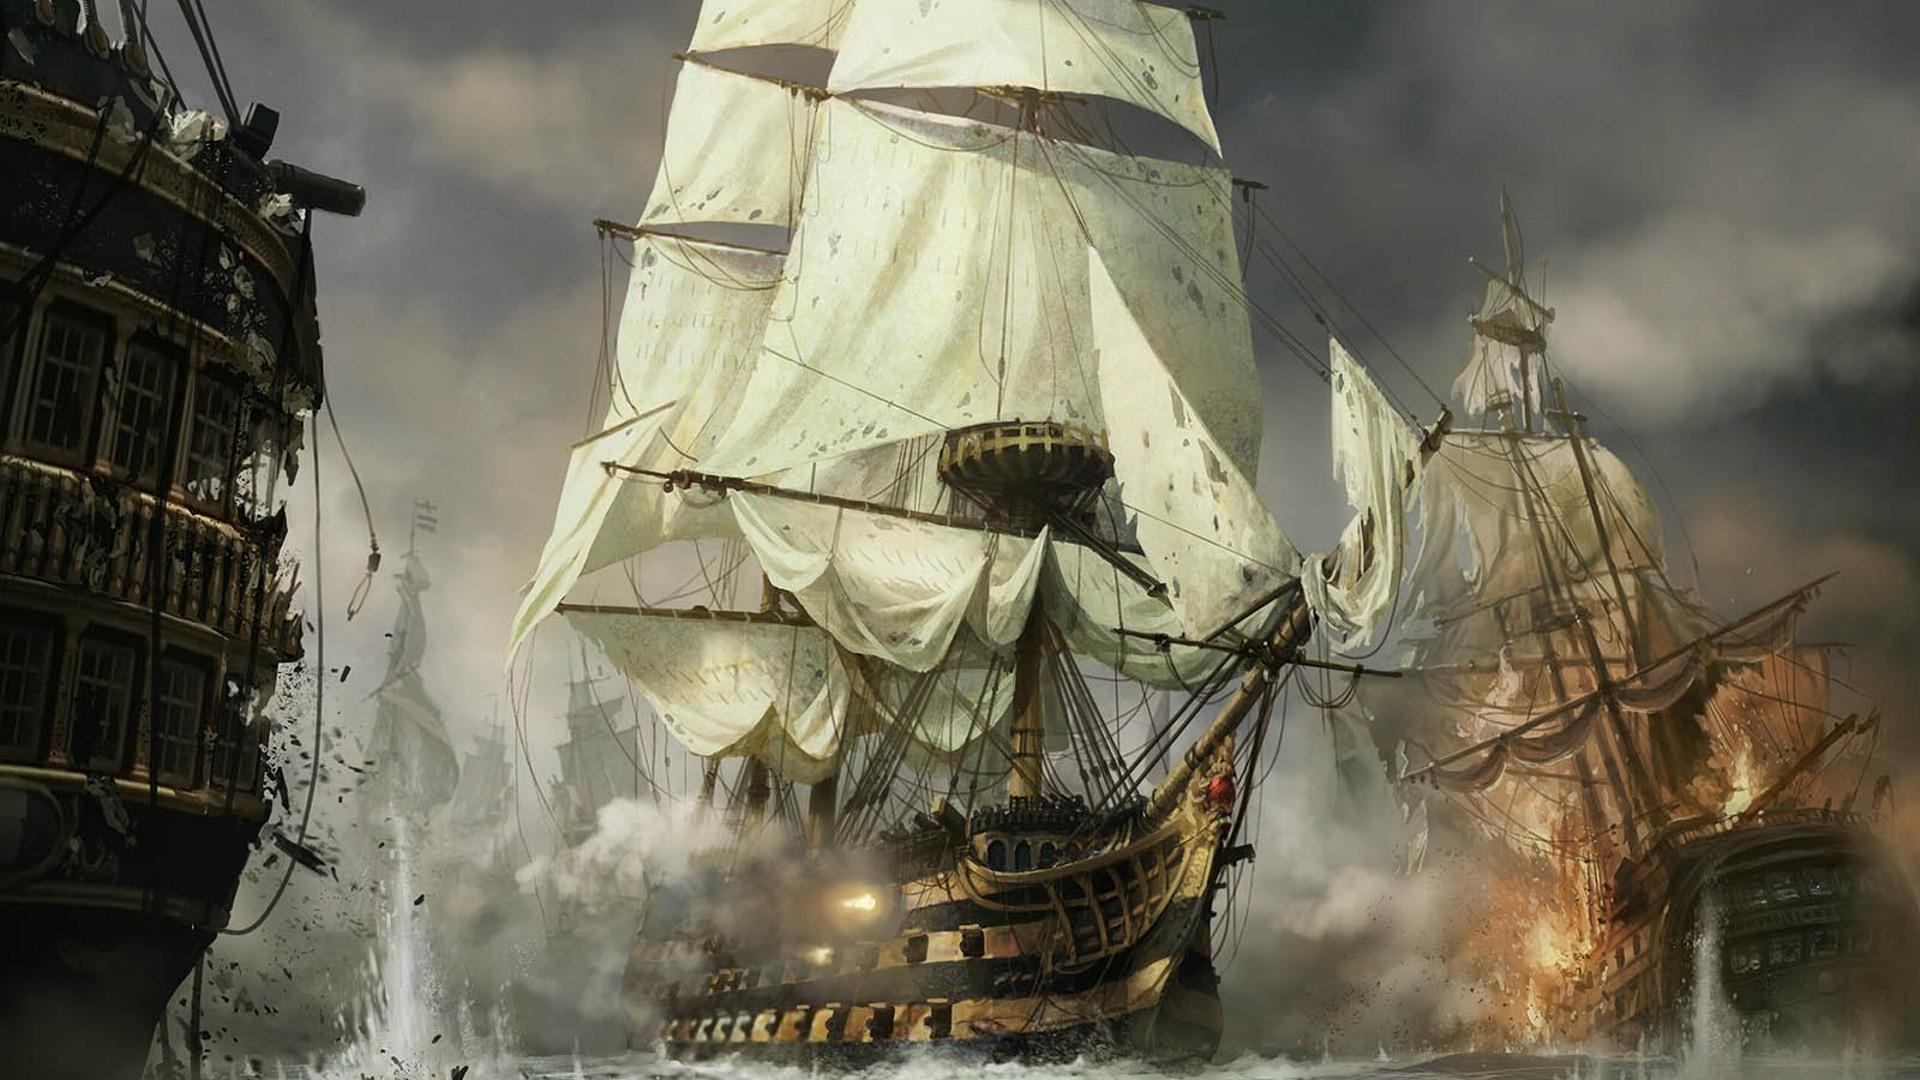 18th Century Naval Battle 1280x800 Download Hd Wallpaper Wallpapertip